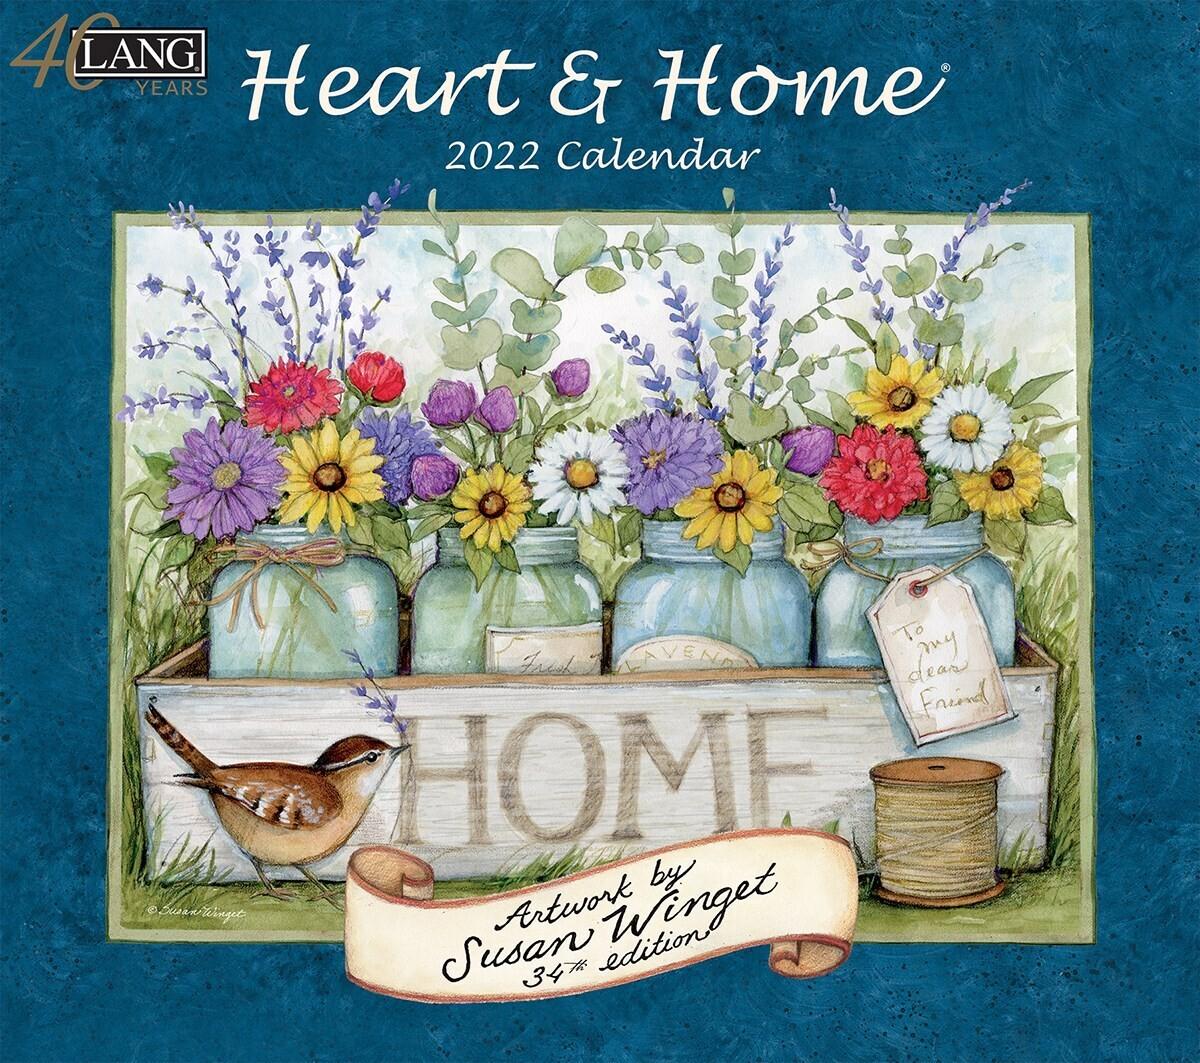 Lang Calendar - Heart and Home - Susan Winget